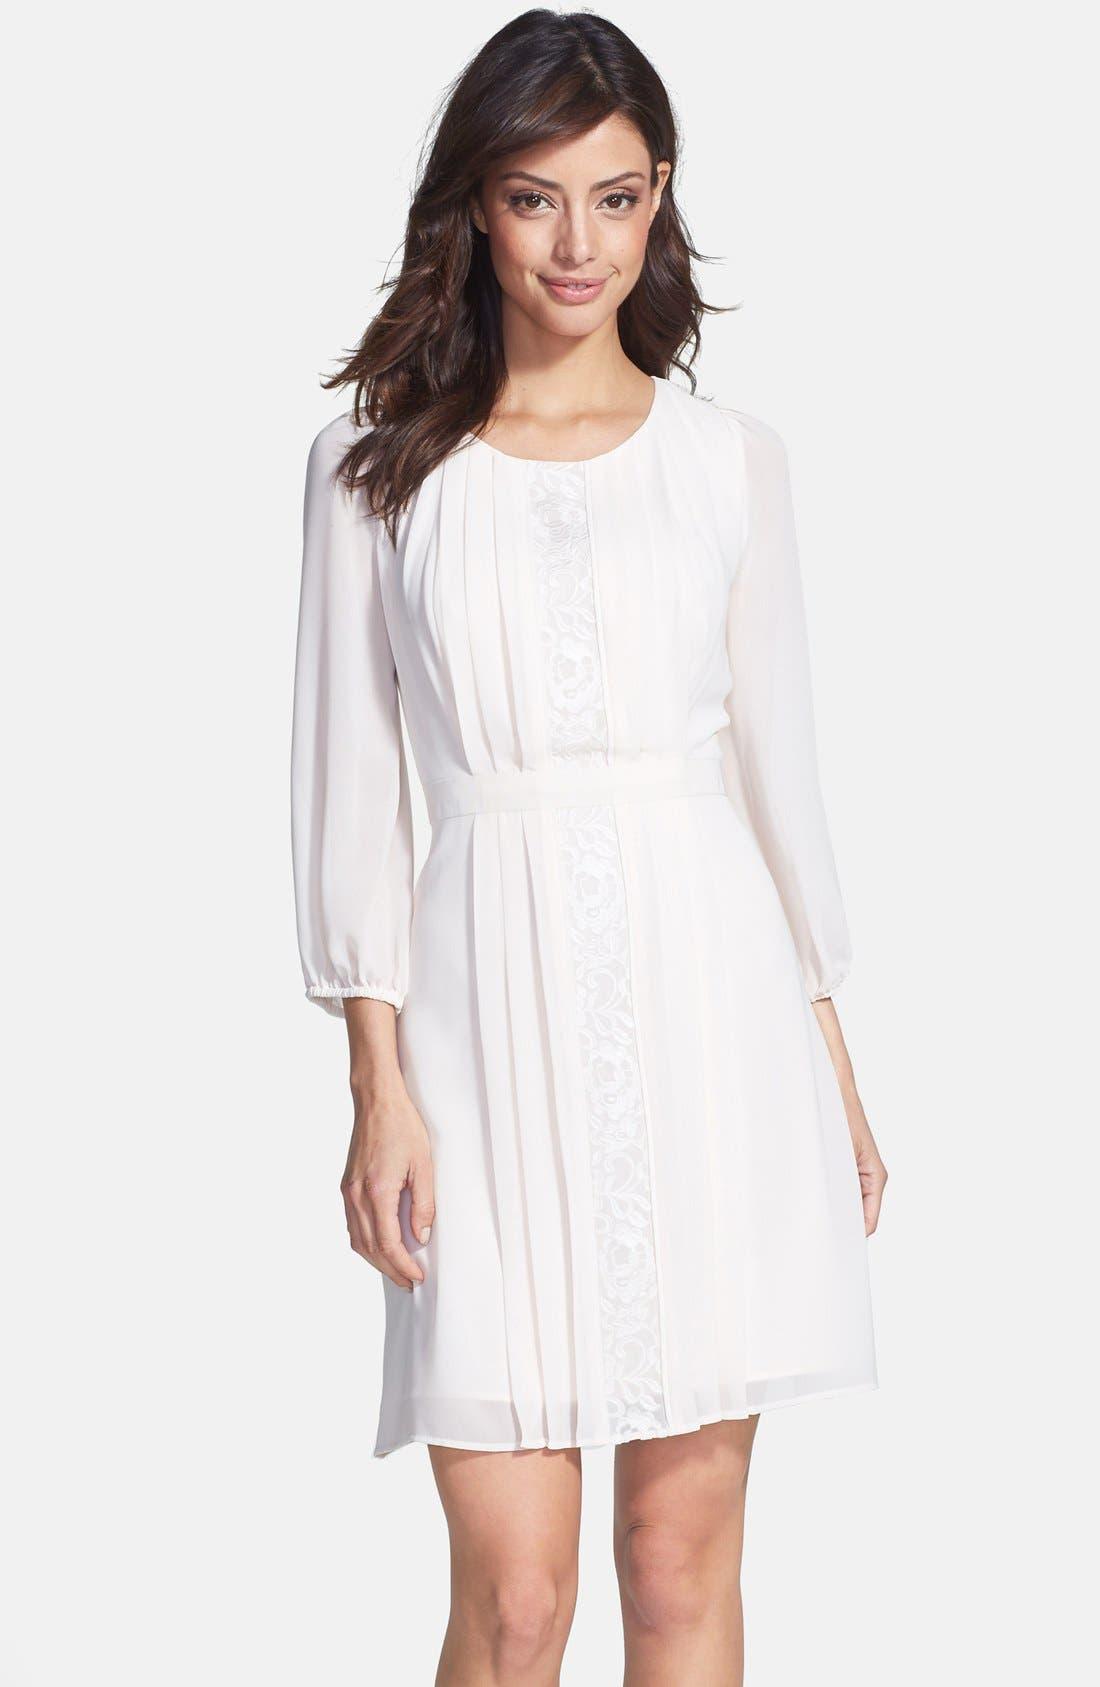 Alternate Image 1 Selected - Jessica Simpson Chiffon Blouson Dress